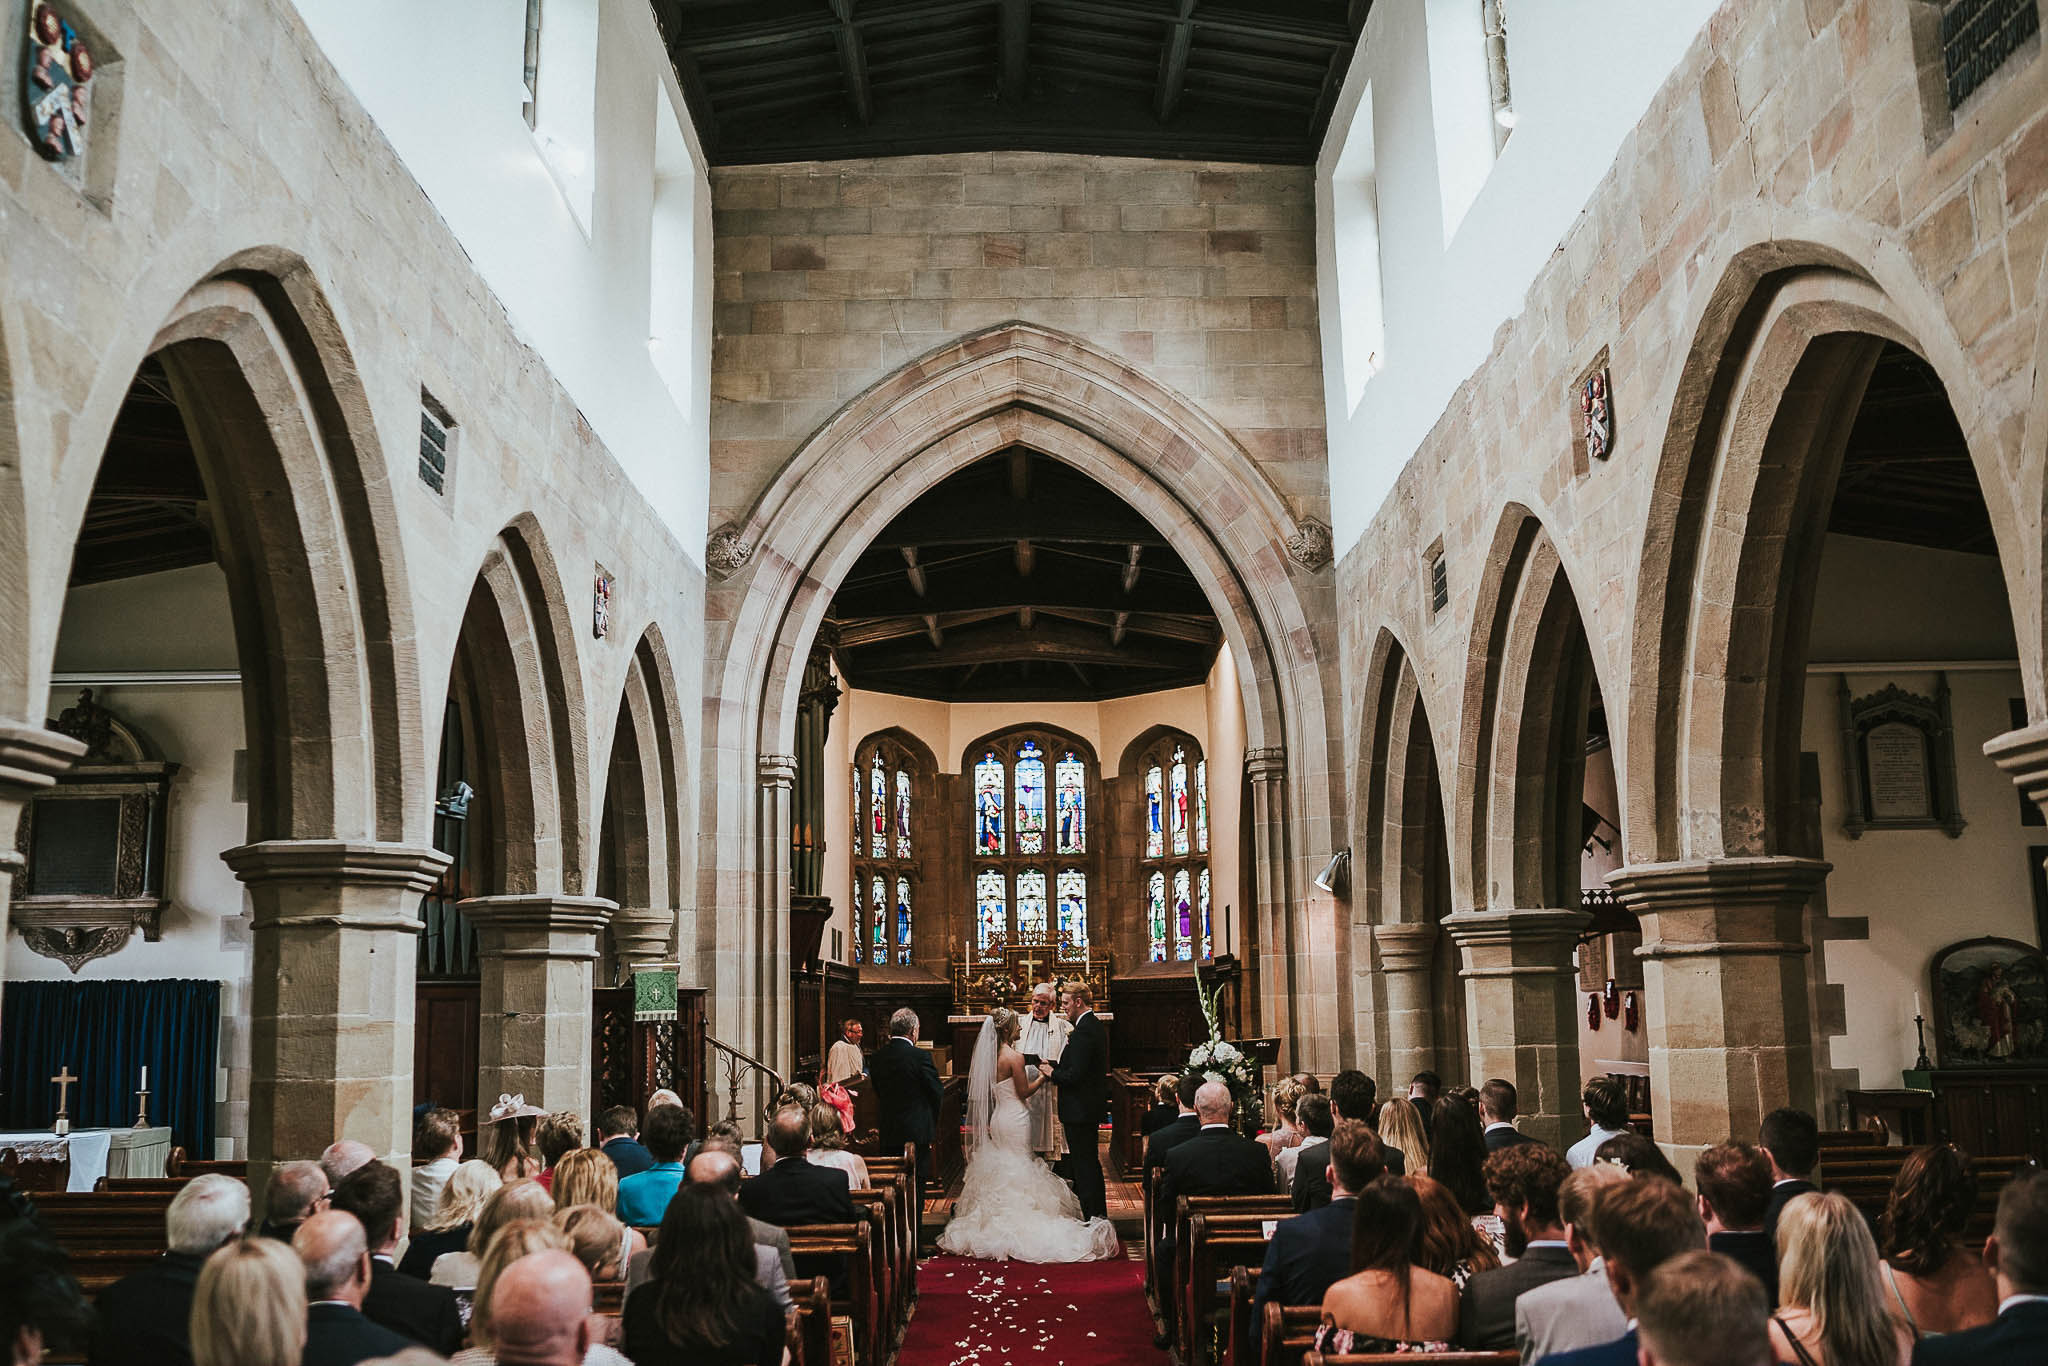 burton-on-trent-church-wedding